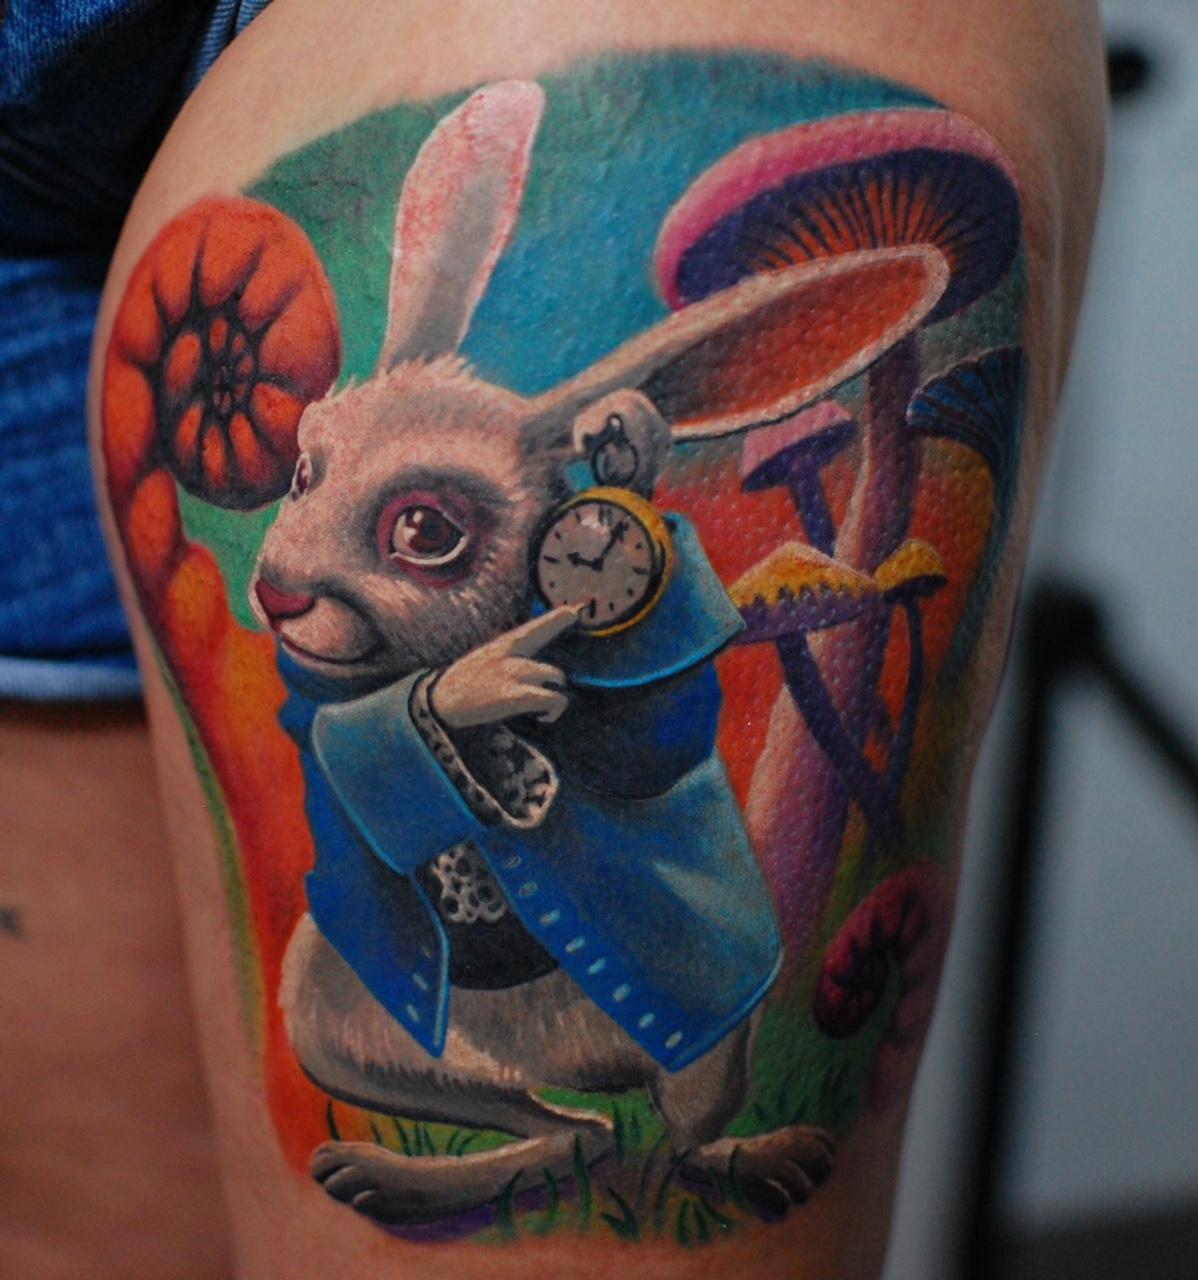 alice in wonderland tattoo bunny hase marci color tattoo shop top best bester beste bestes münchen tempel